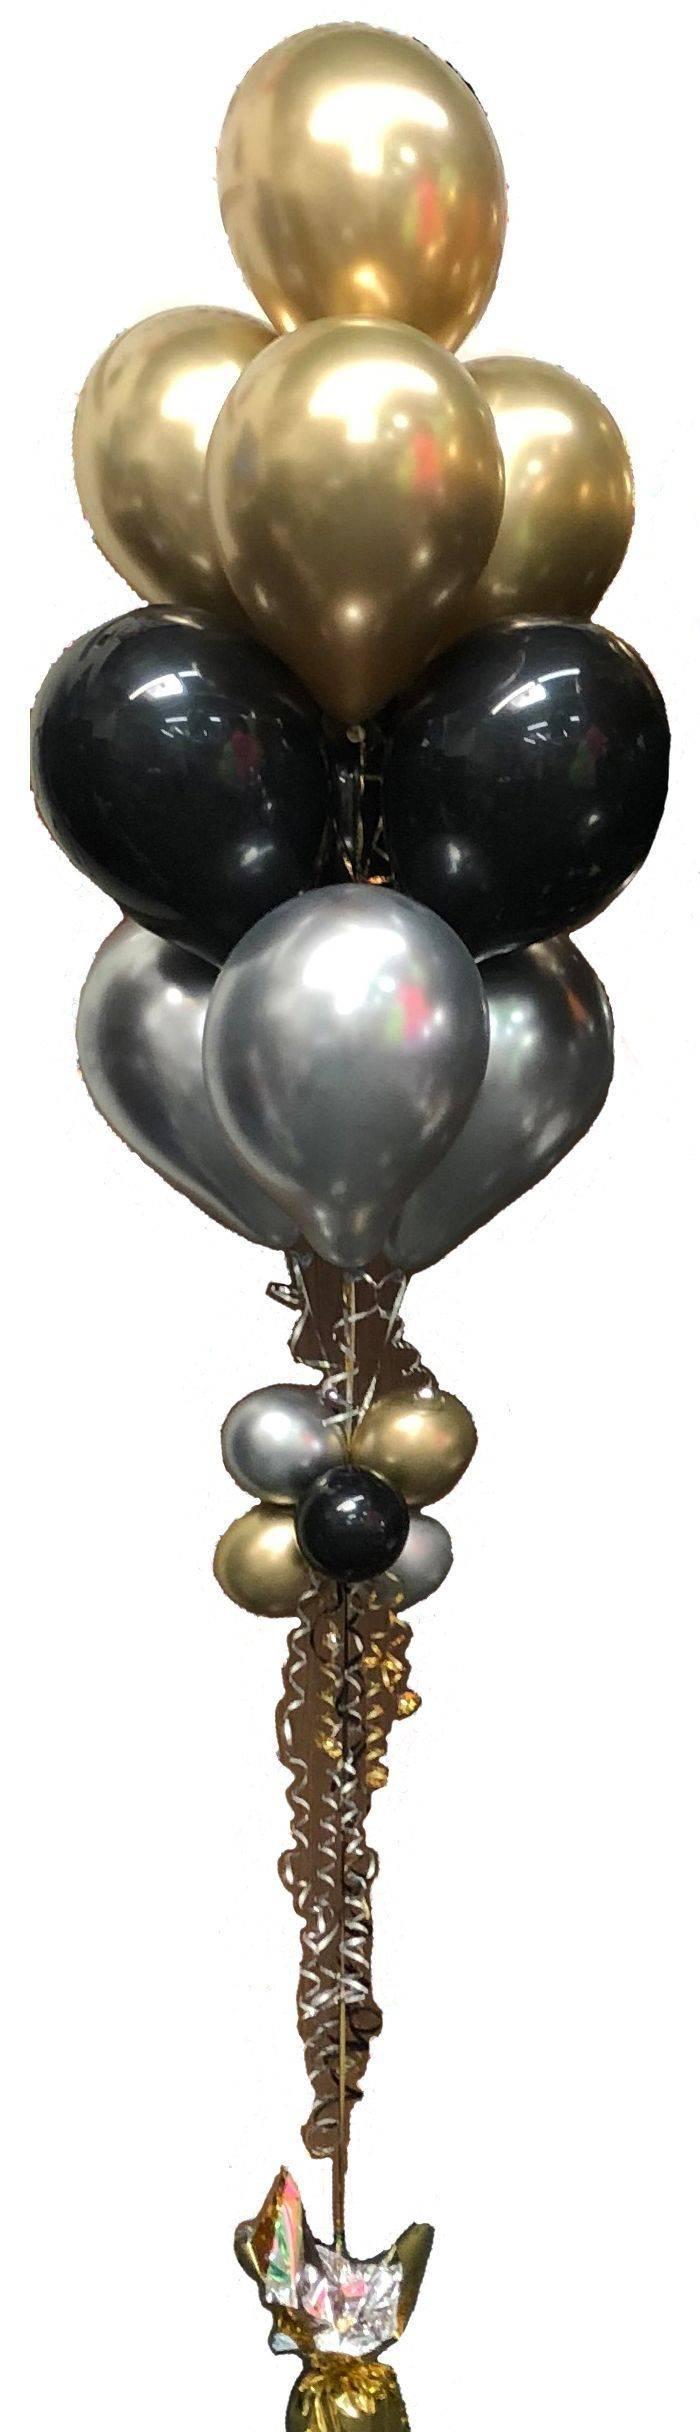 Ten Balloon Bouquet Stack